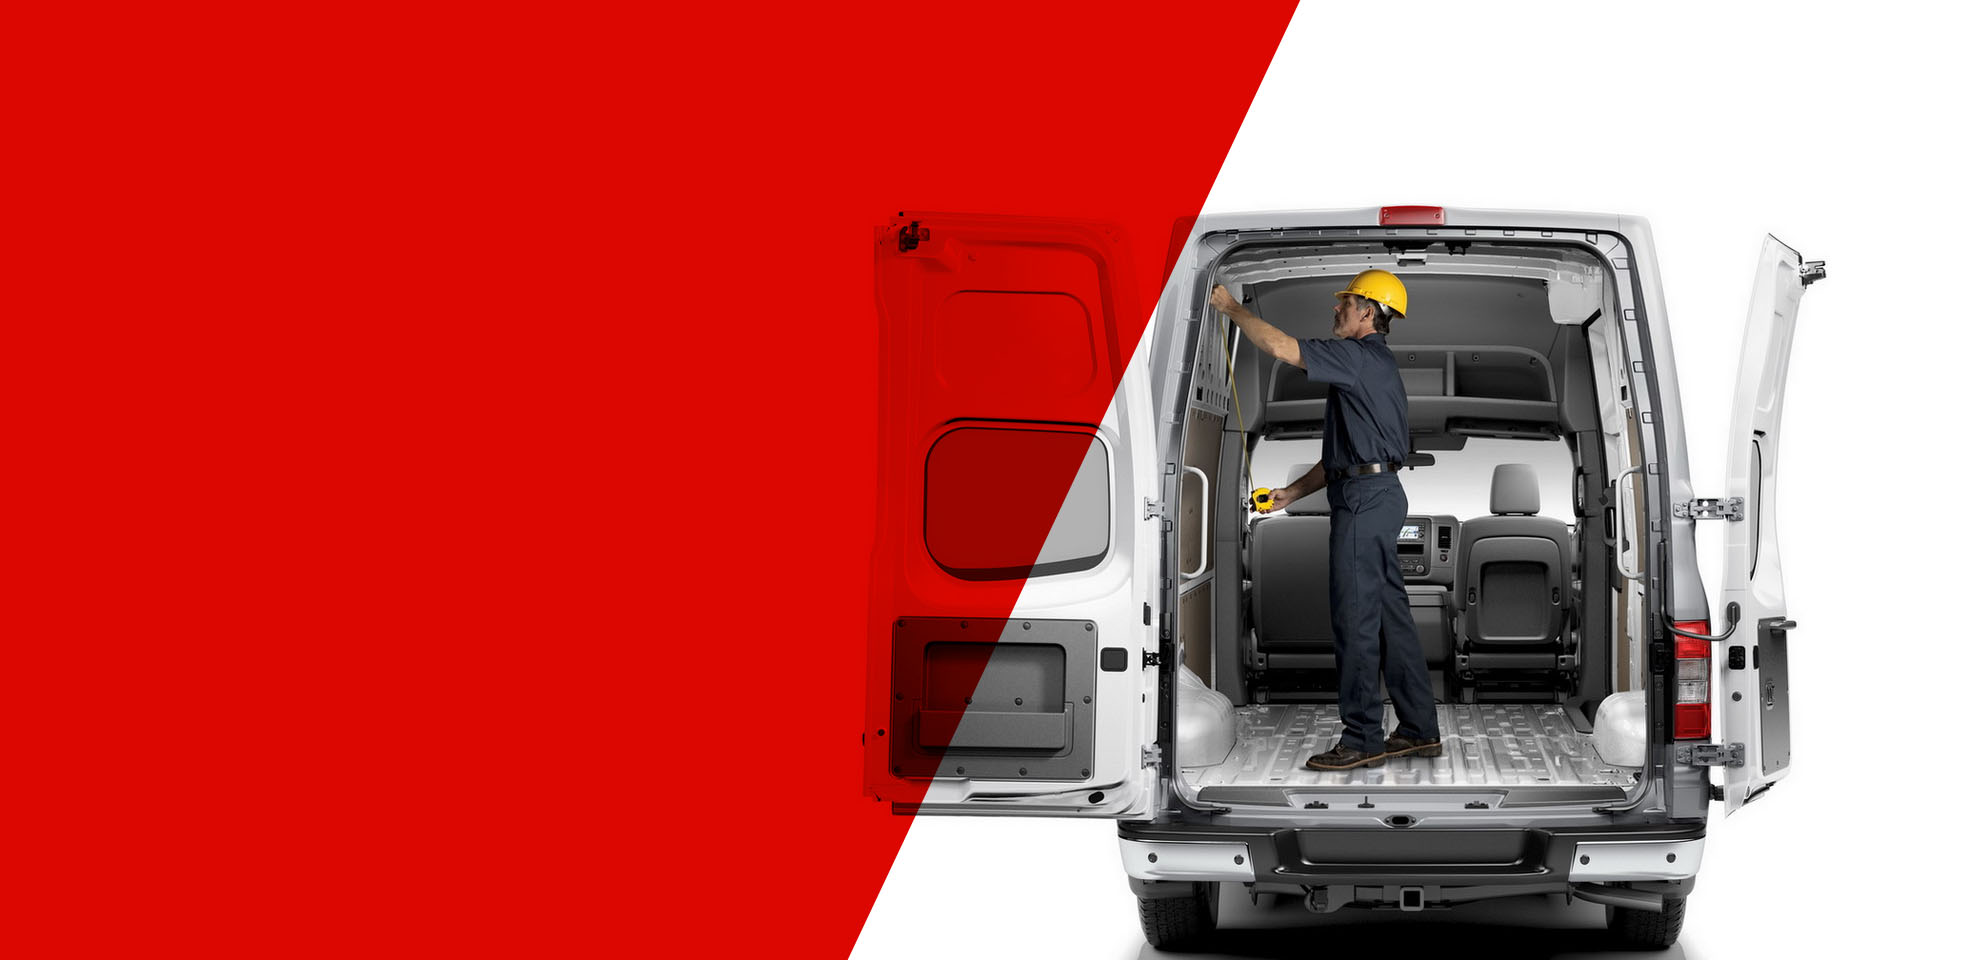 Farmbro | Commercial Vehicle Upfitting